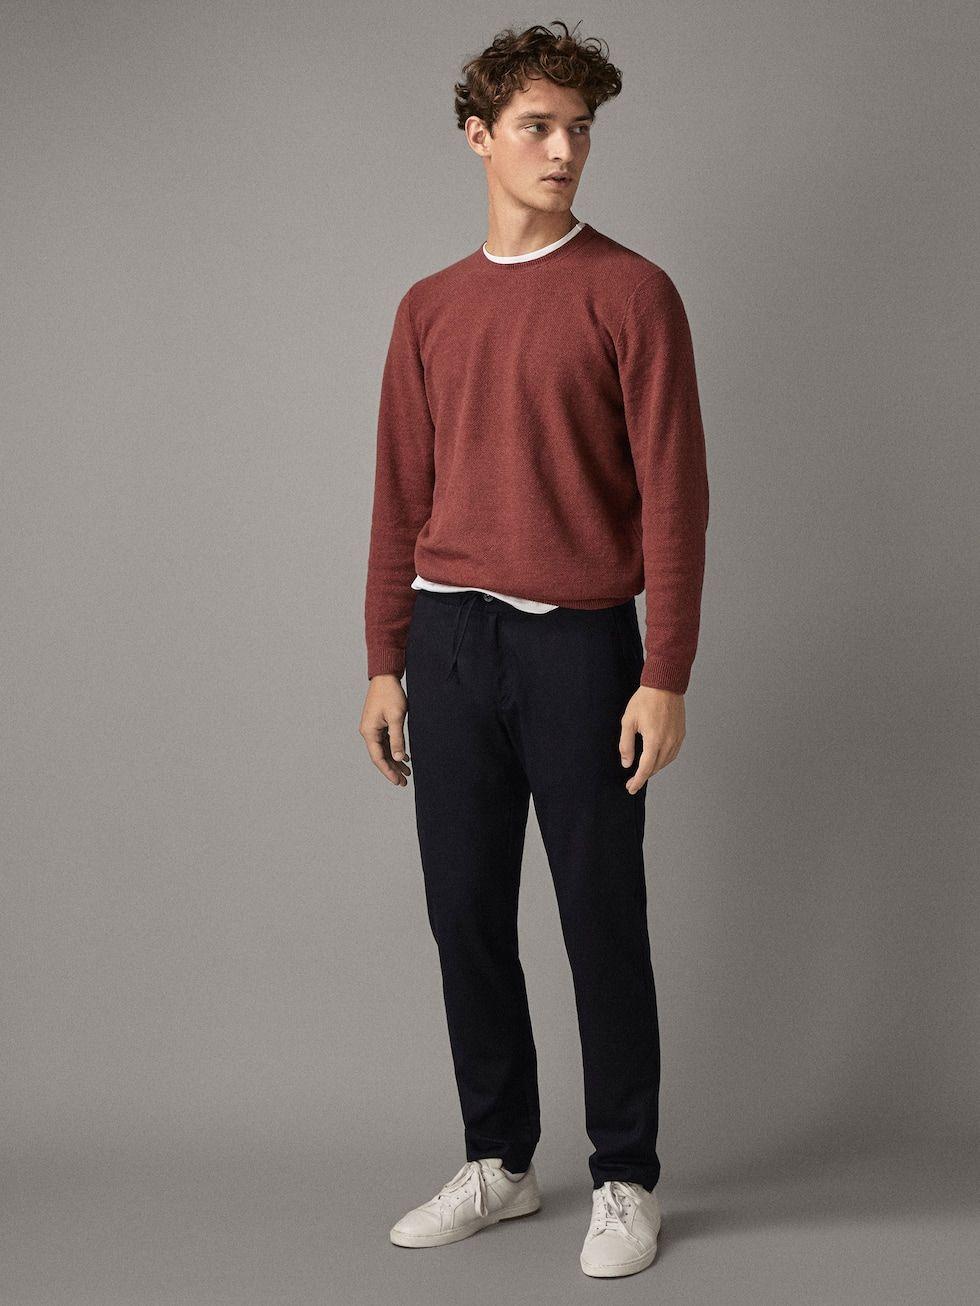 New In Men S Collection Massimo Dutti Autumn Winter 2018 Minimalist Fashion Men Stylish Men Casual Stylish Men